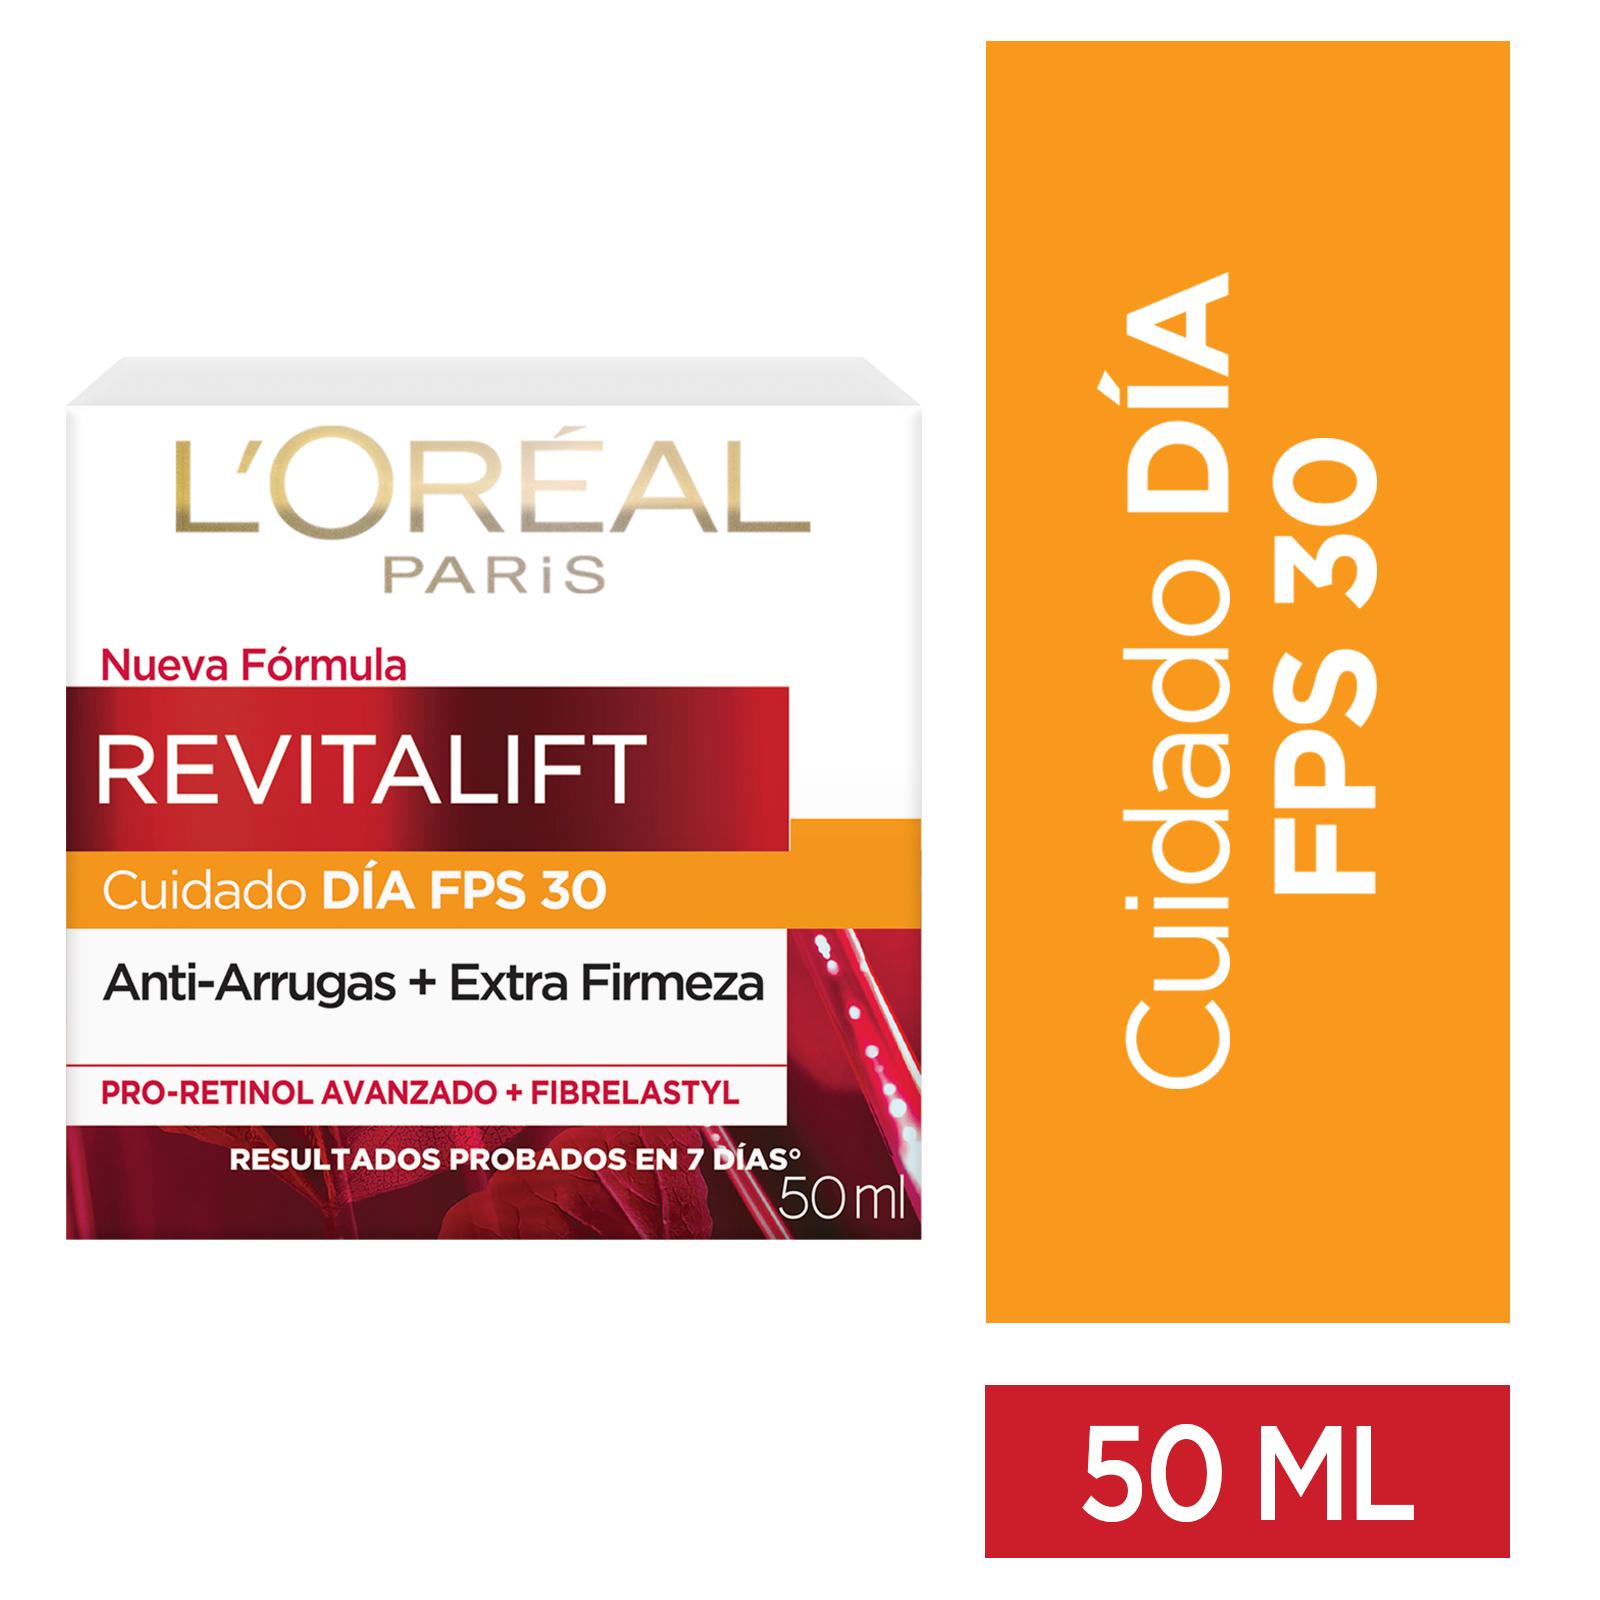 Crema Loreal Revitalift Fps30 dia 50ml